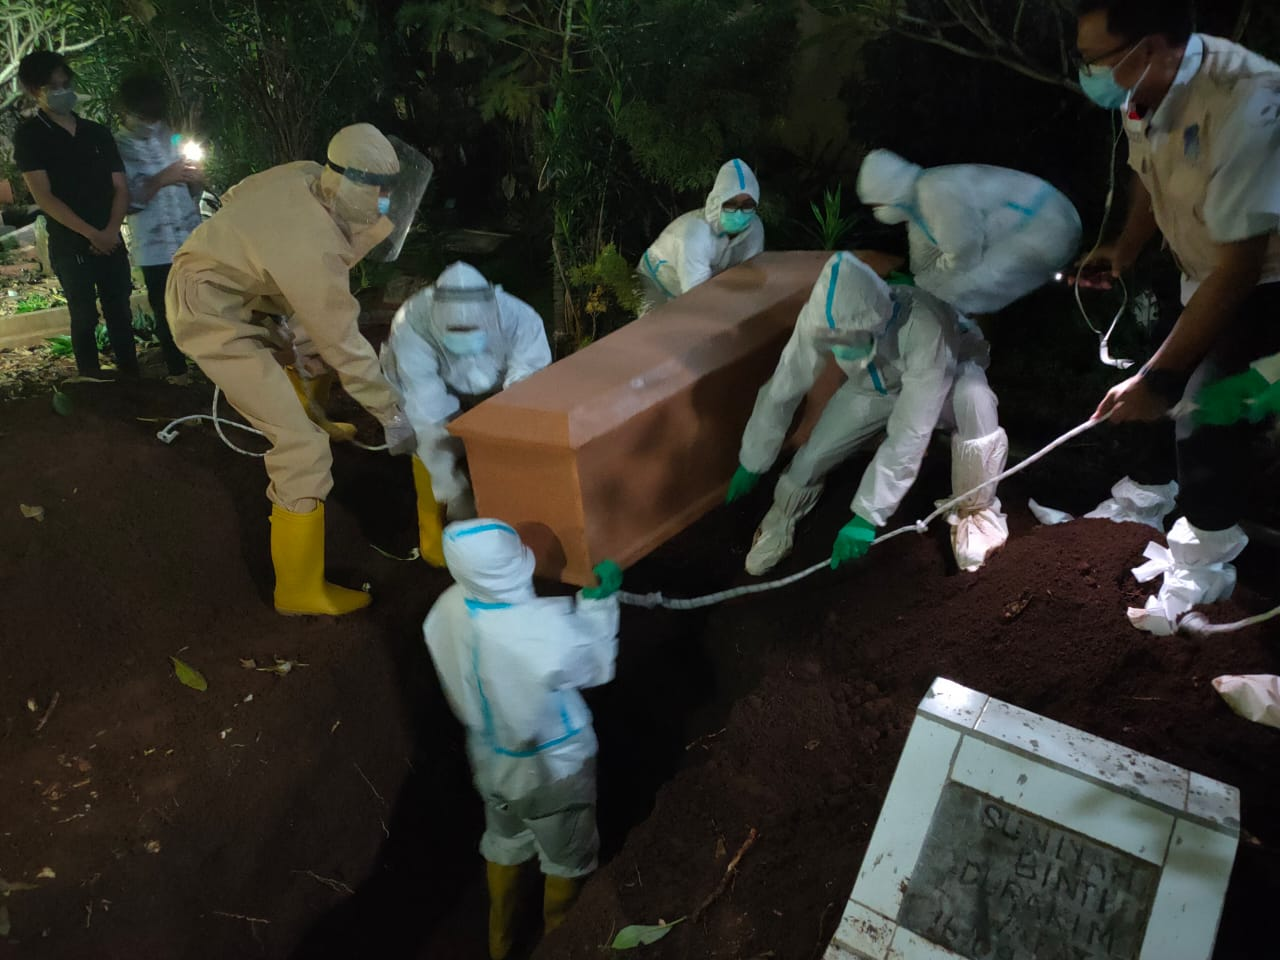 Babinsa Koramil 410-06/Kedaton Serda Andreswan yang tergabung dalam Tim evakuasi Satuan Tugas Percepatan Penanganan Covid-19 Kota Bandar Lampung, melaksanakan prosesi pemakaman jenazah konfirmasi Positif Covid-19